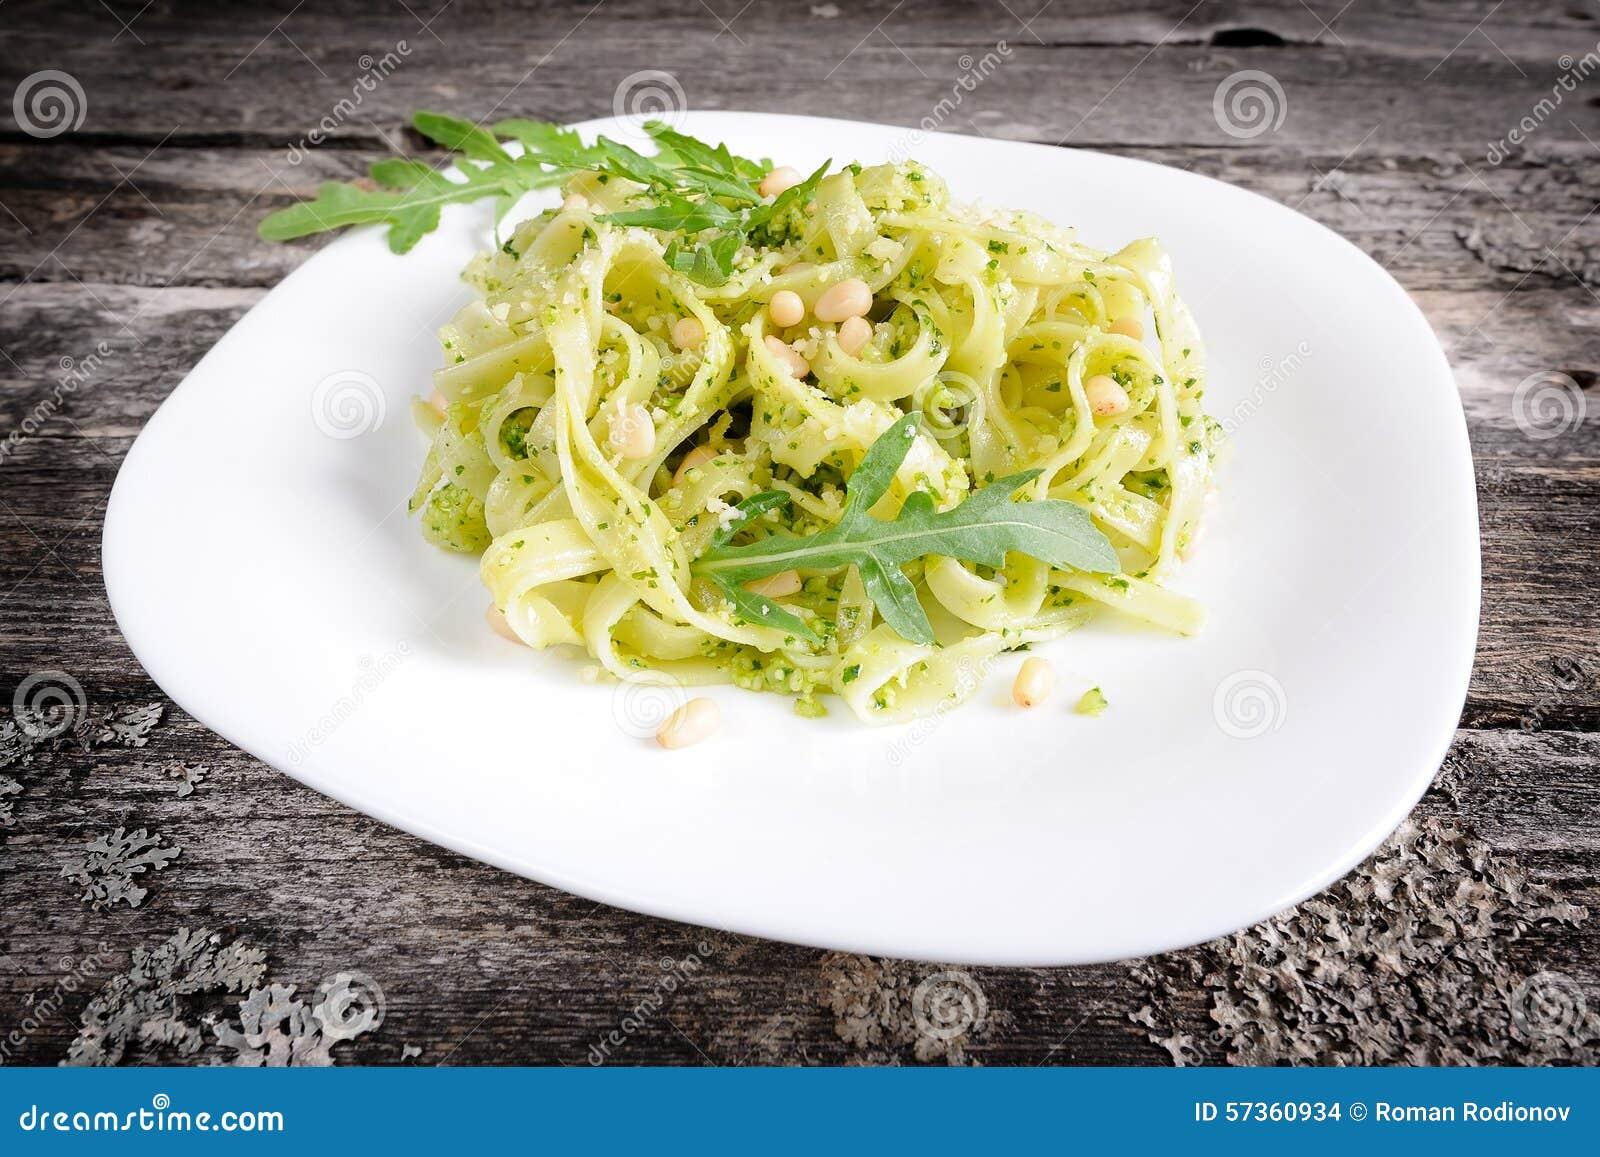 Tagliatelle with pesto stock photo. Image of nature, dish ...